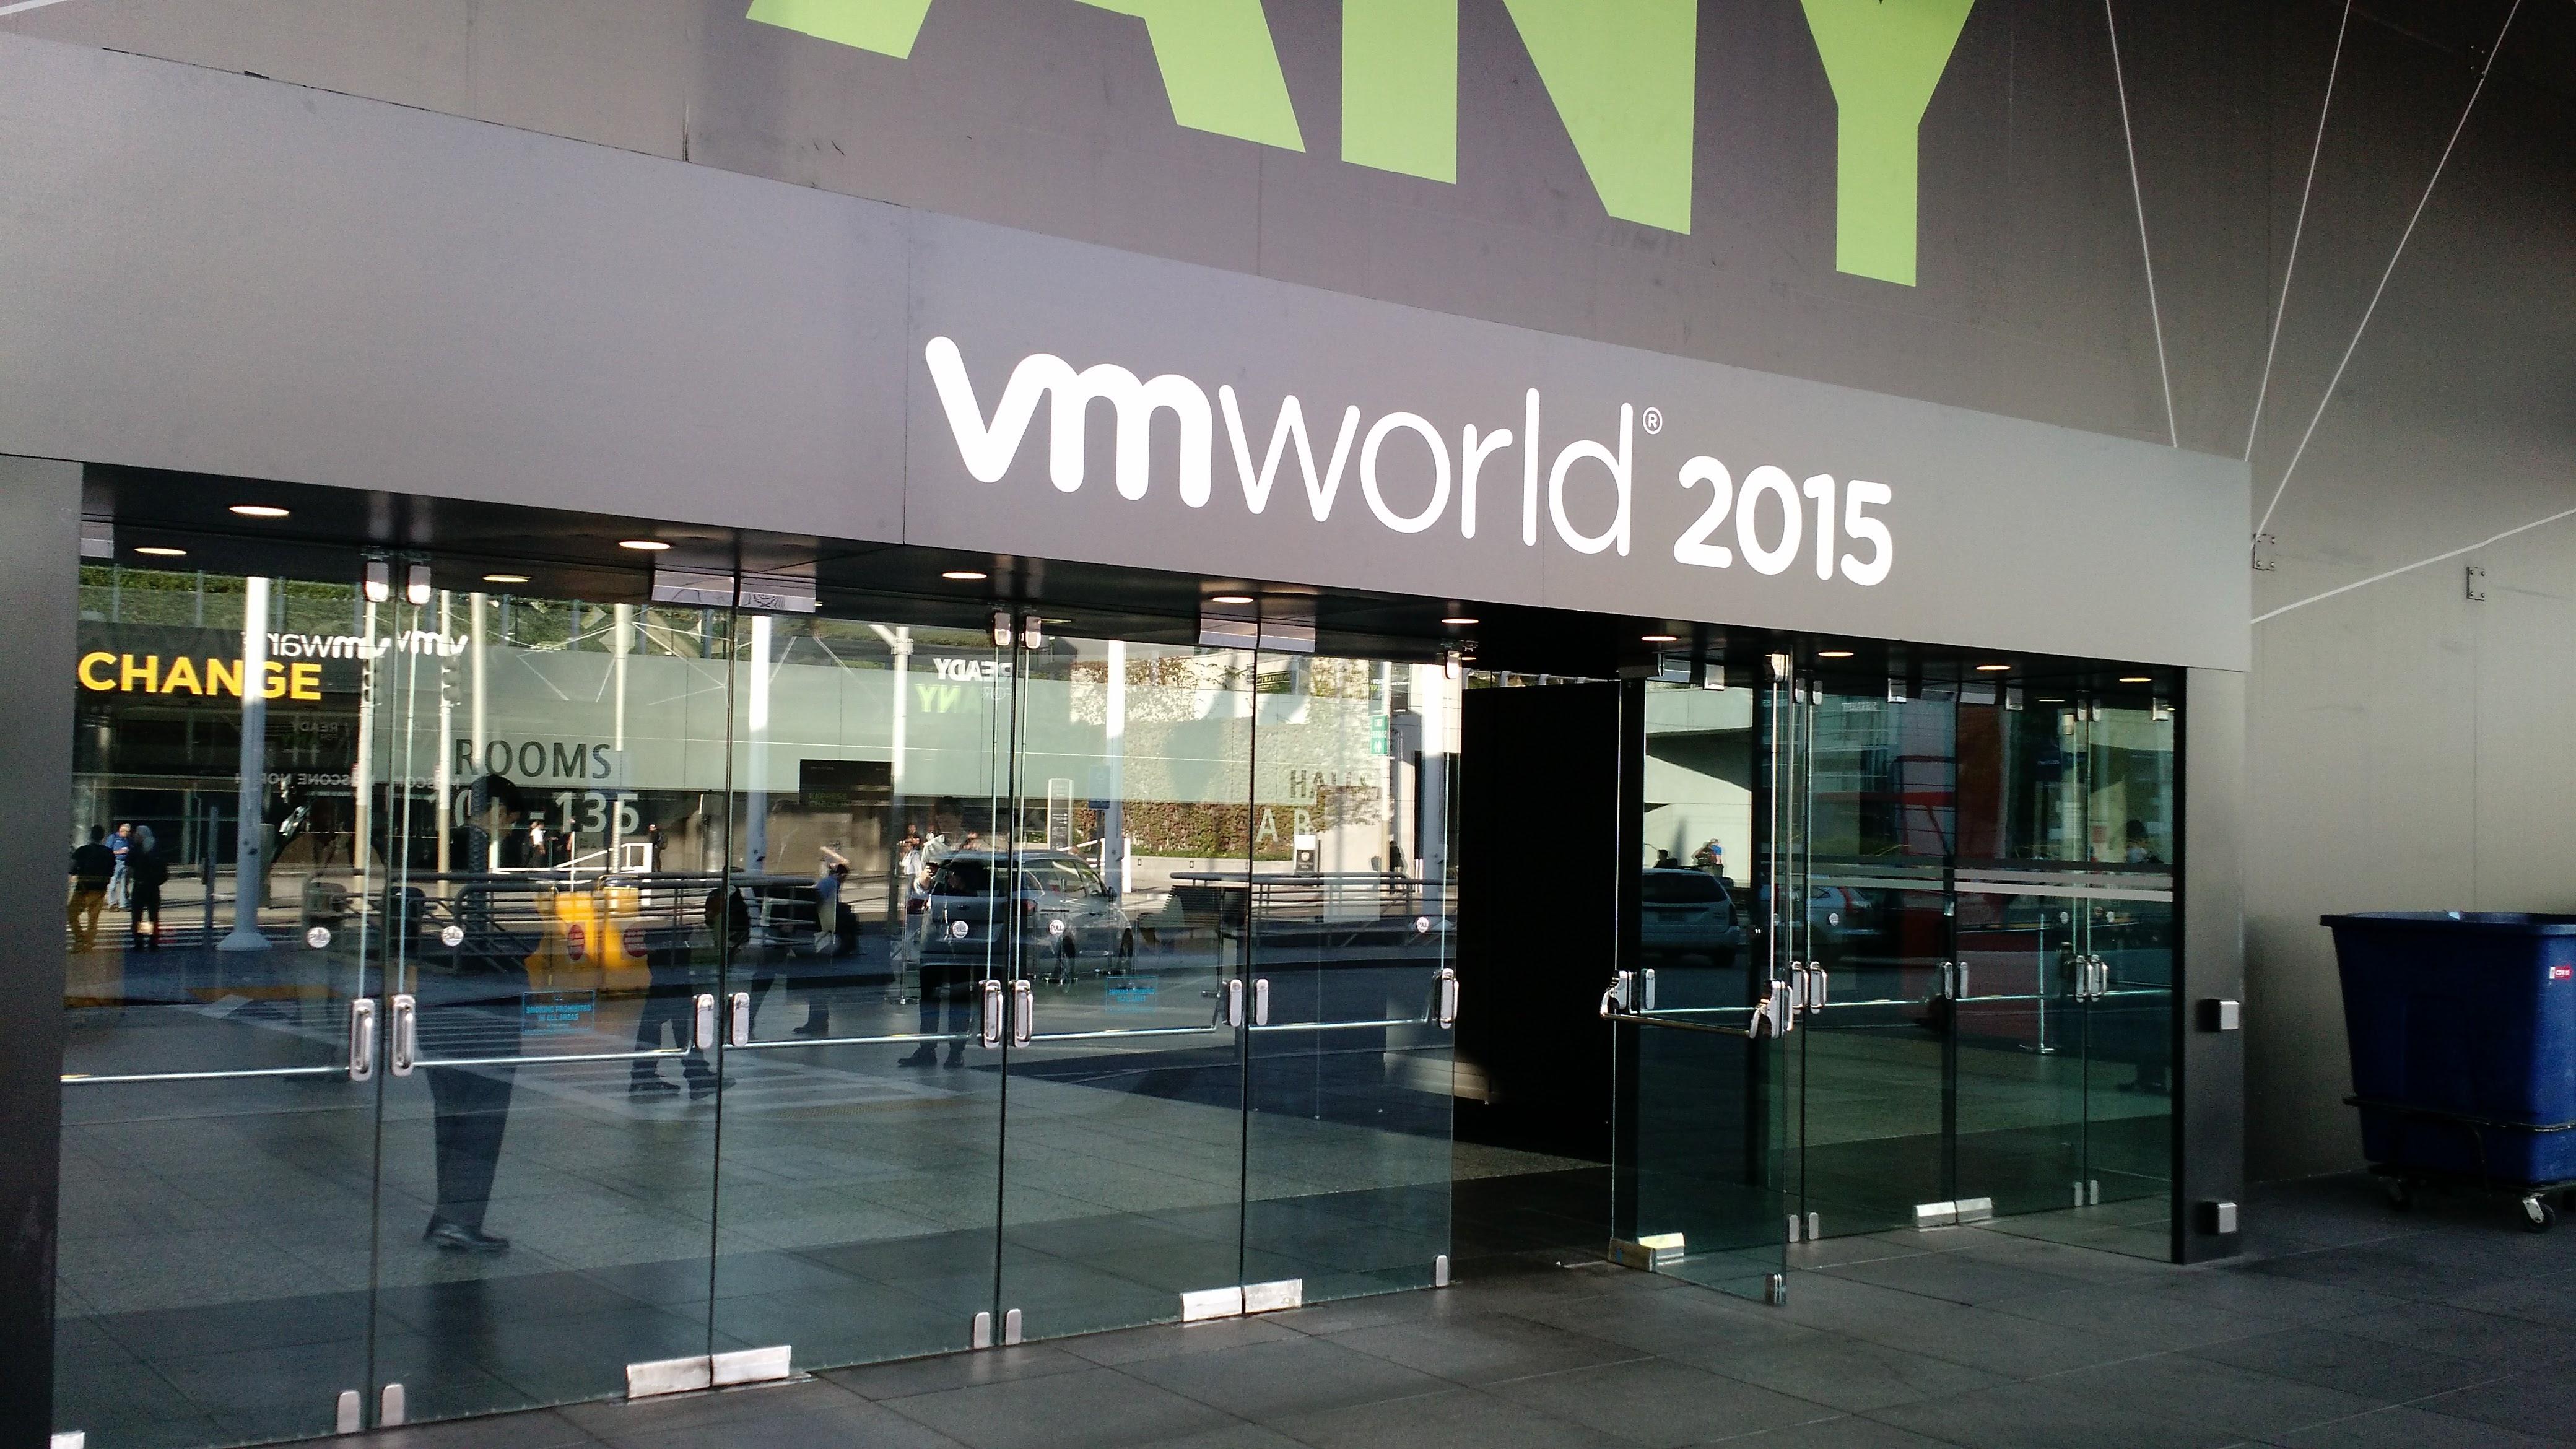 At VMware's 2015 VMworld conference in San Francisco.